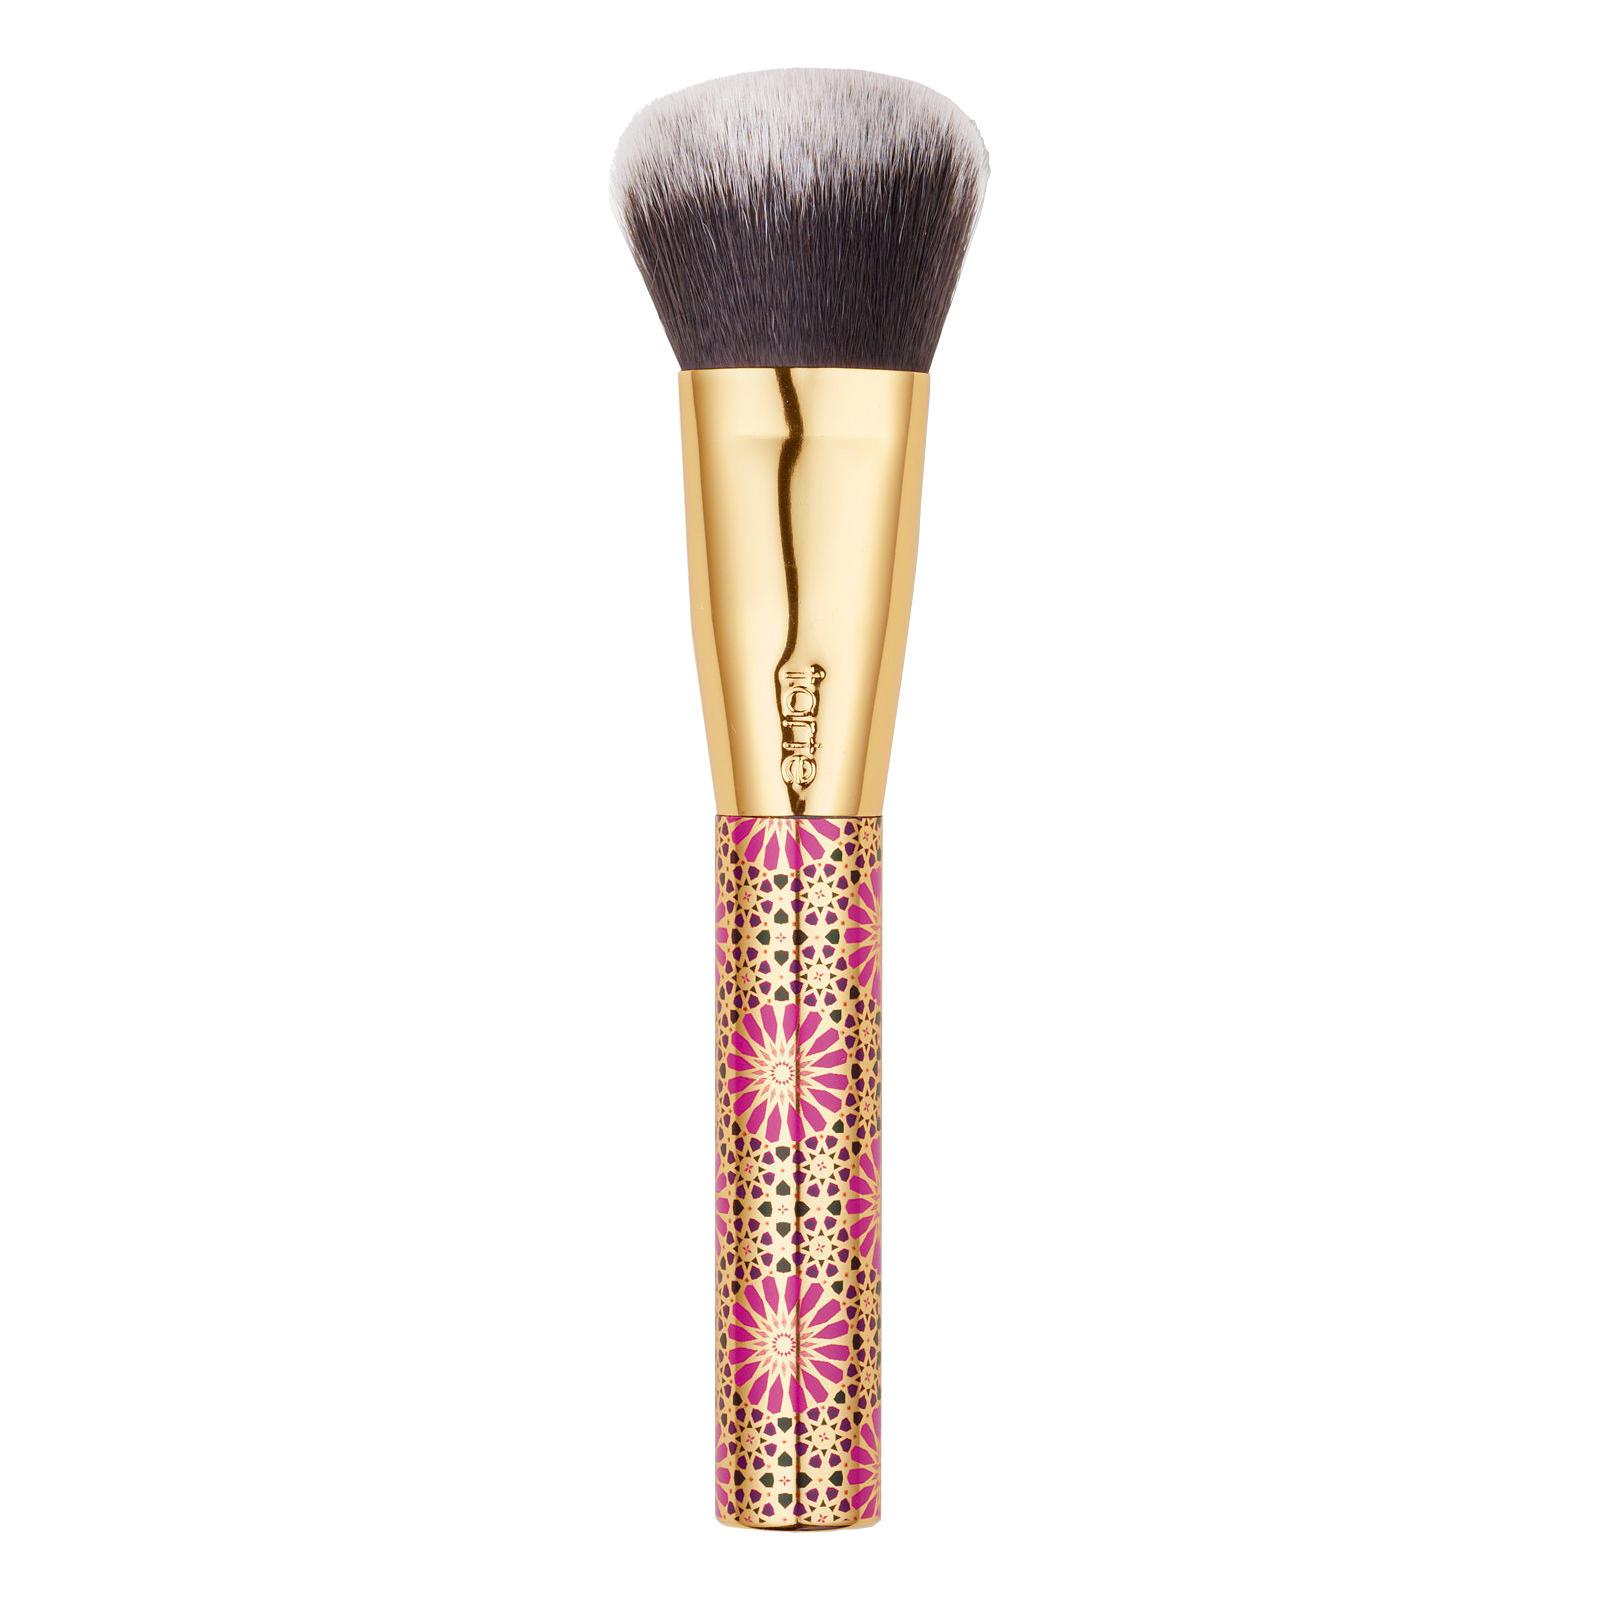 Tarte Artful Powder Cheek Brush